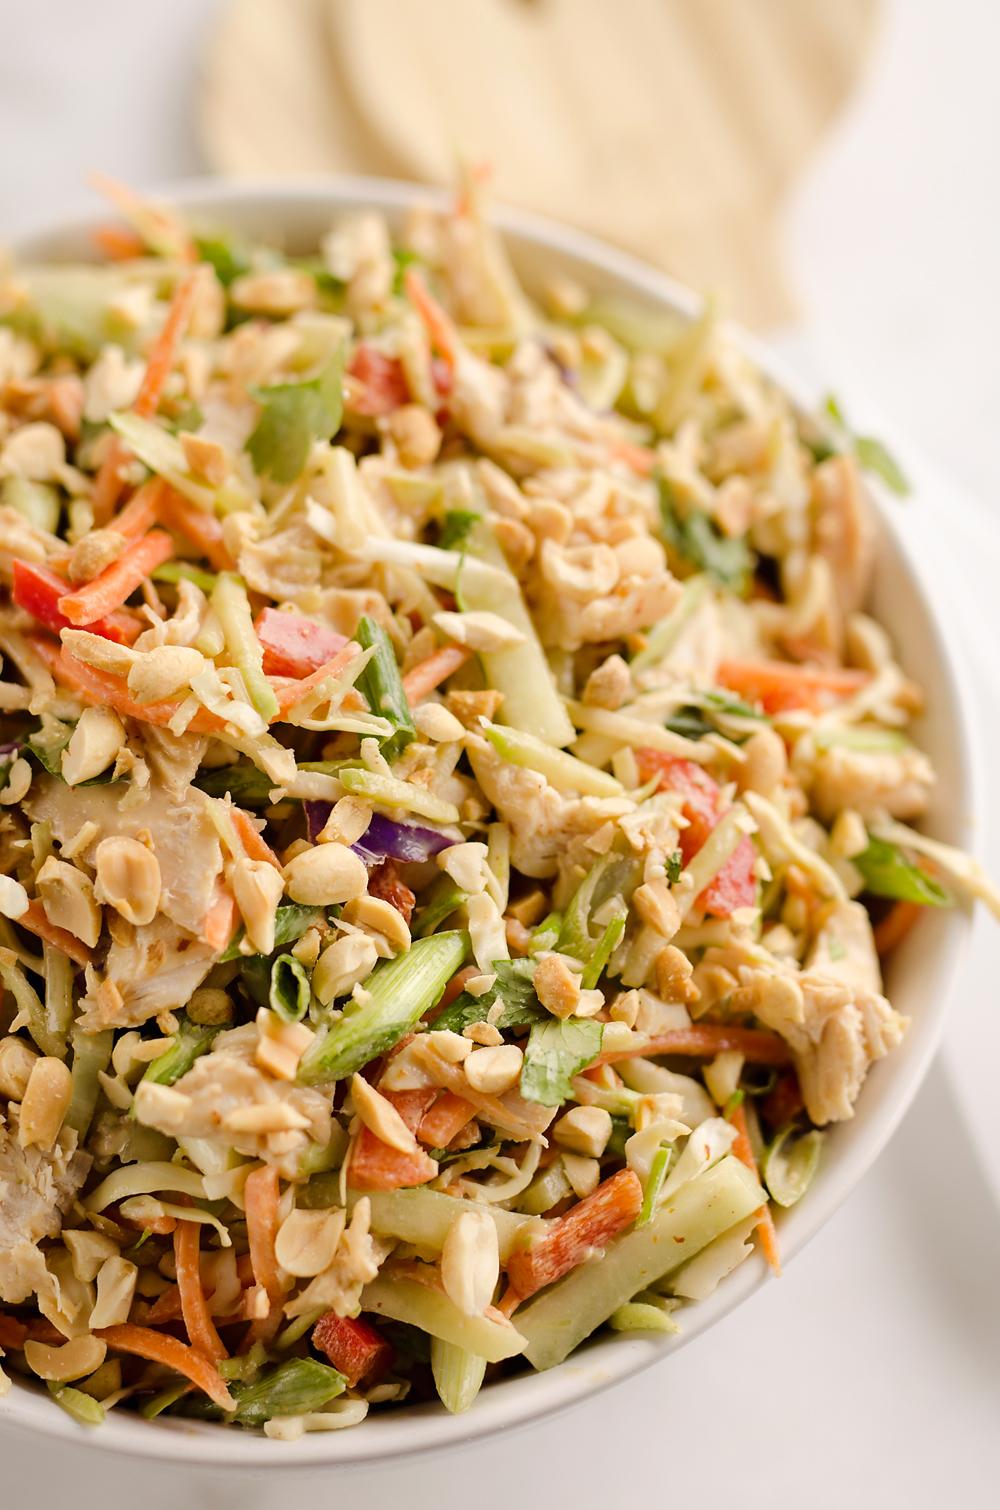 Thai peanut chicken crunch slaw salad the creative bite 4 copy